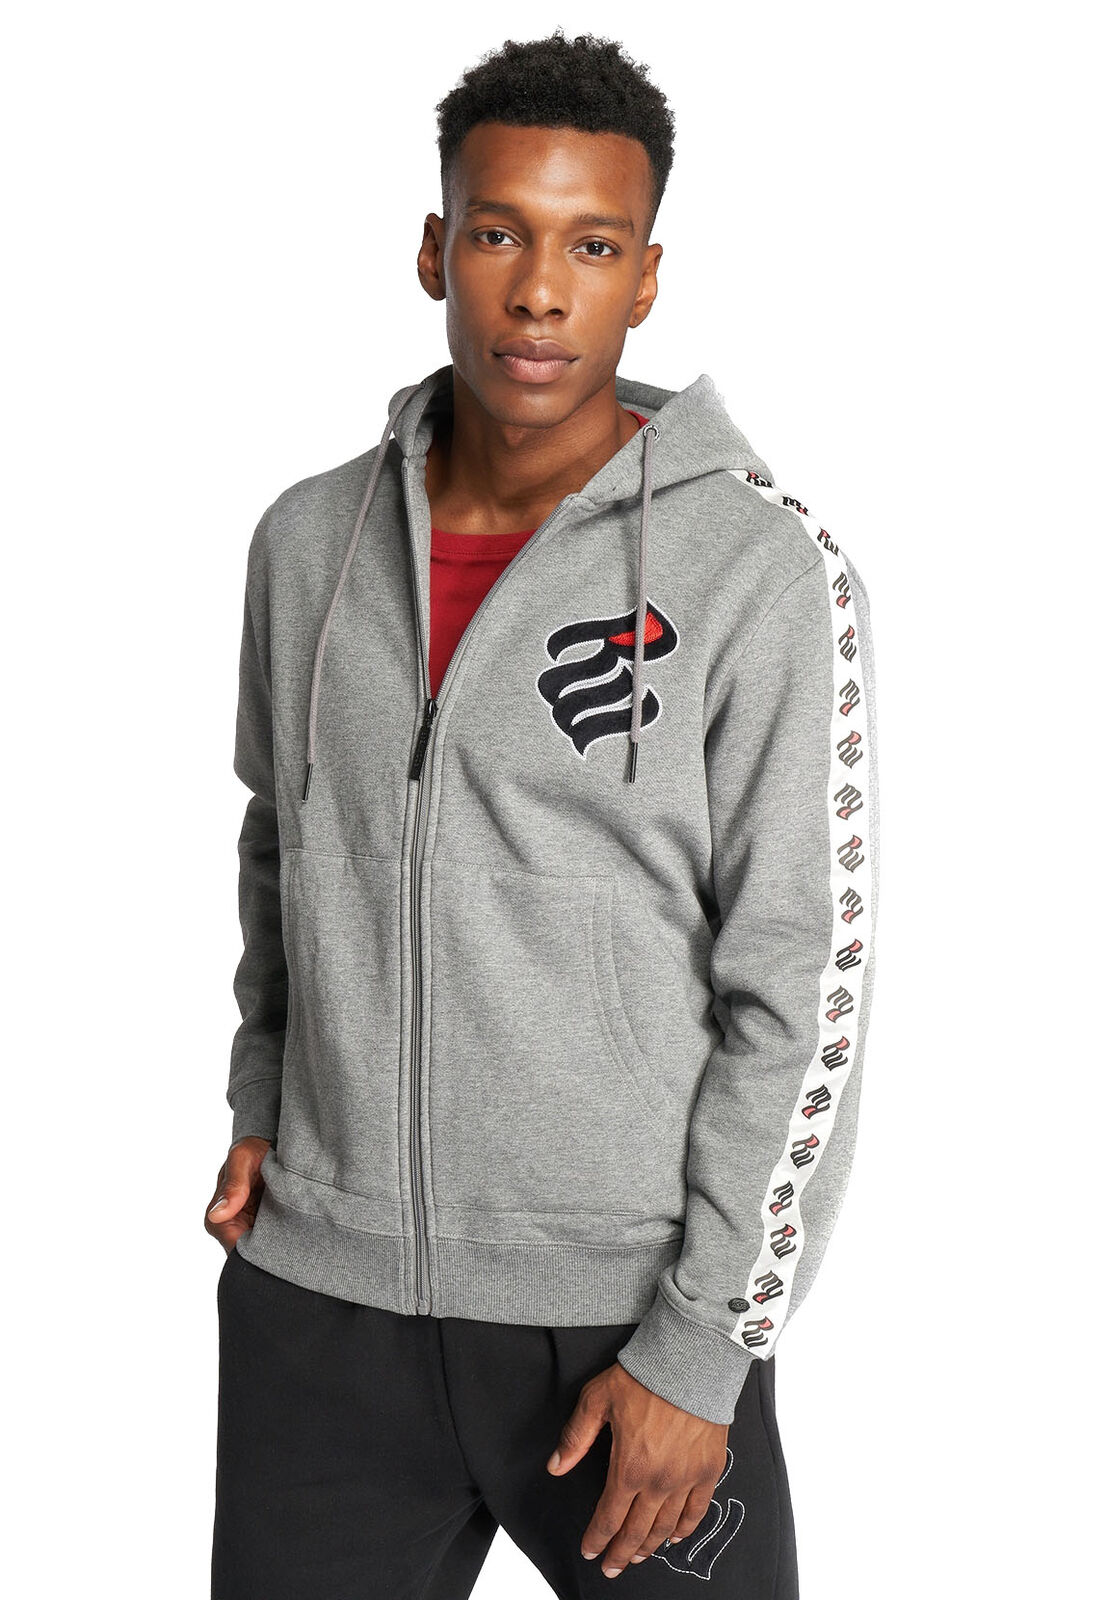 Rocawear Zipper Herren STRIPE RWZH005GM Grau Grau Melange